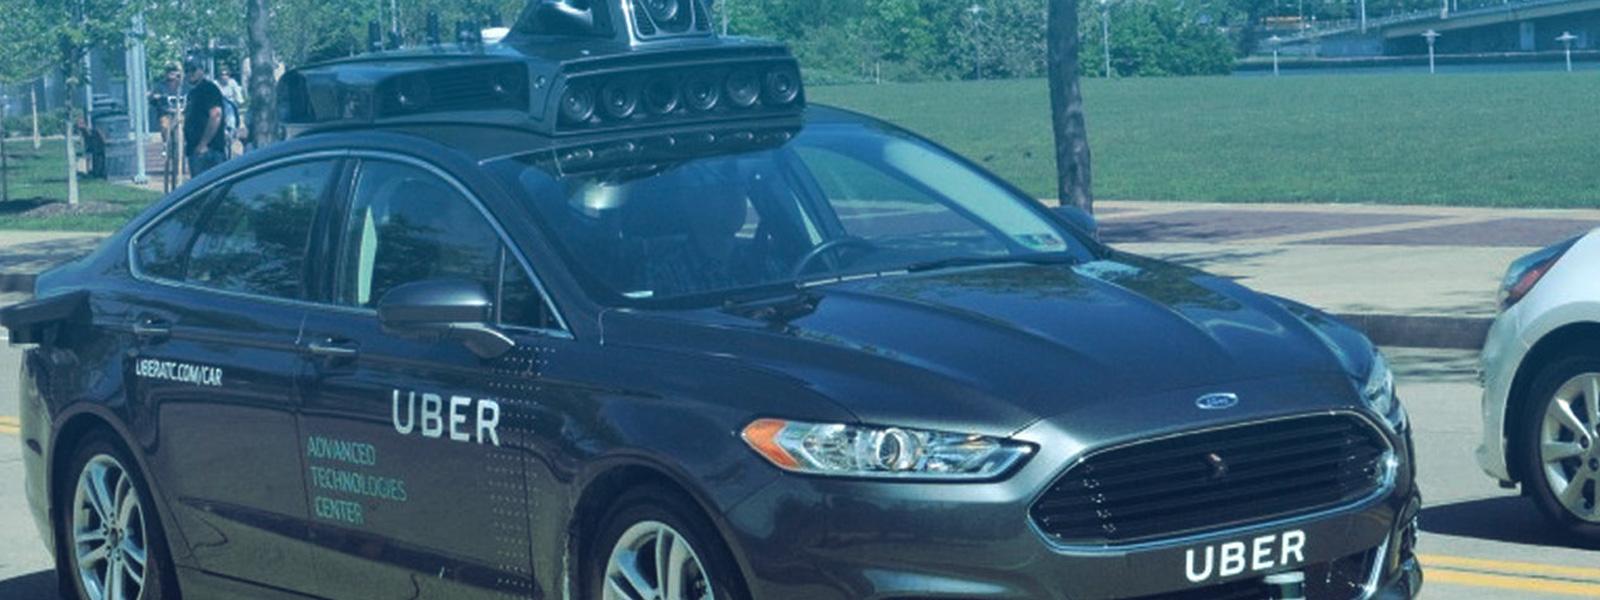 capa-carros-autonomos-uber-estao-testes-california-blog-ceabs